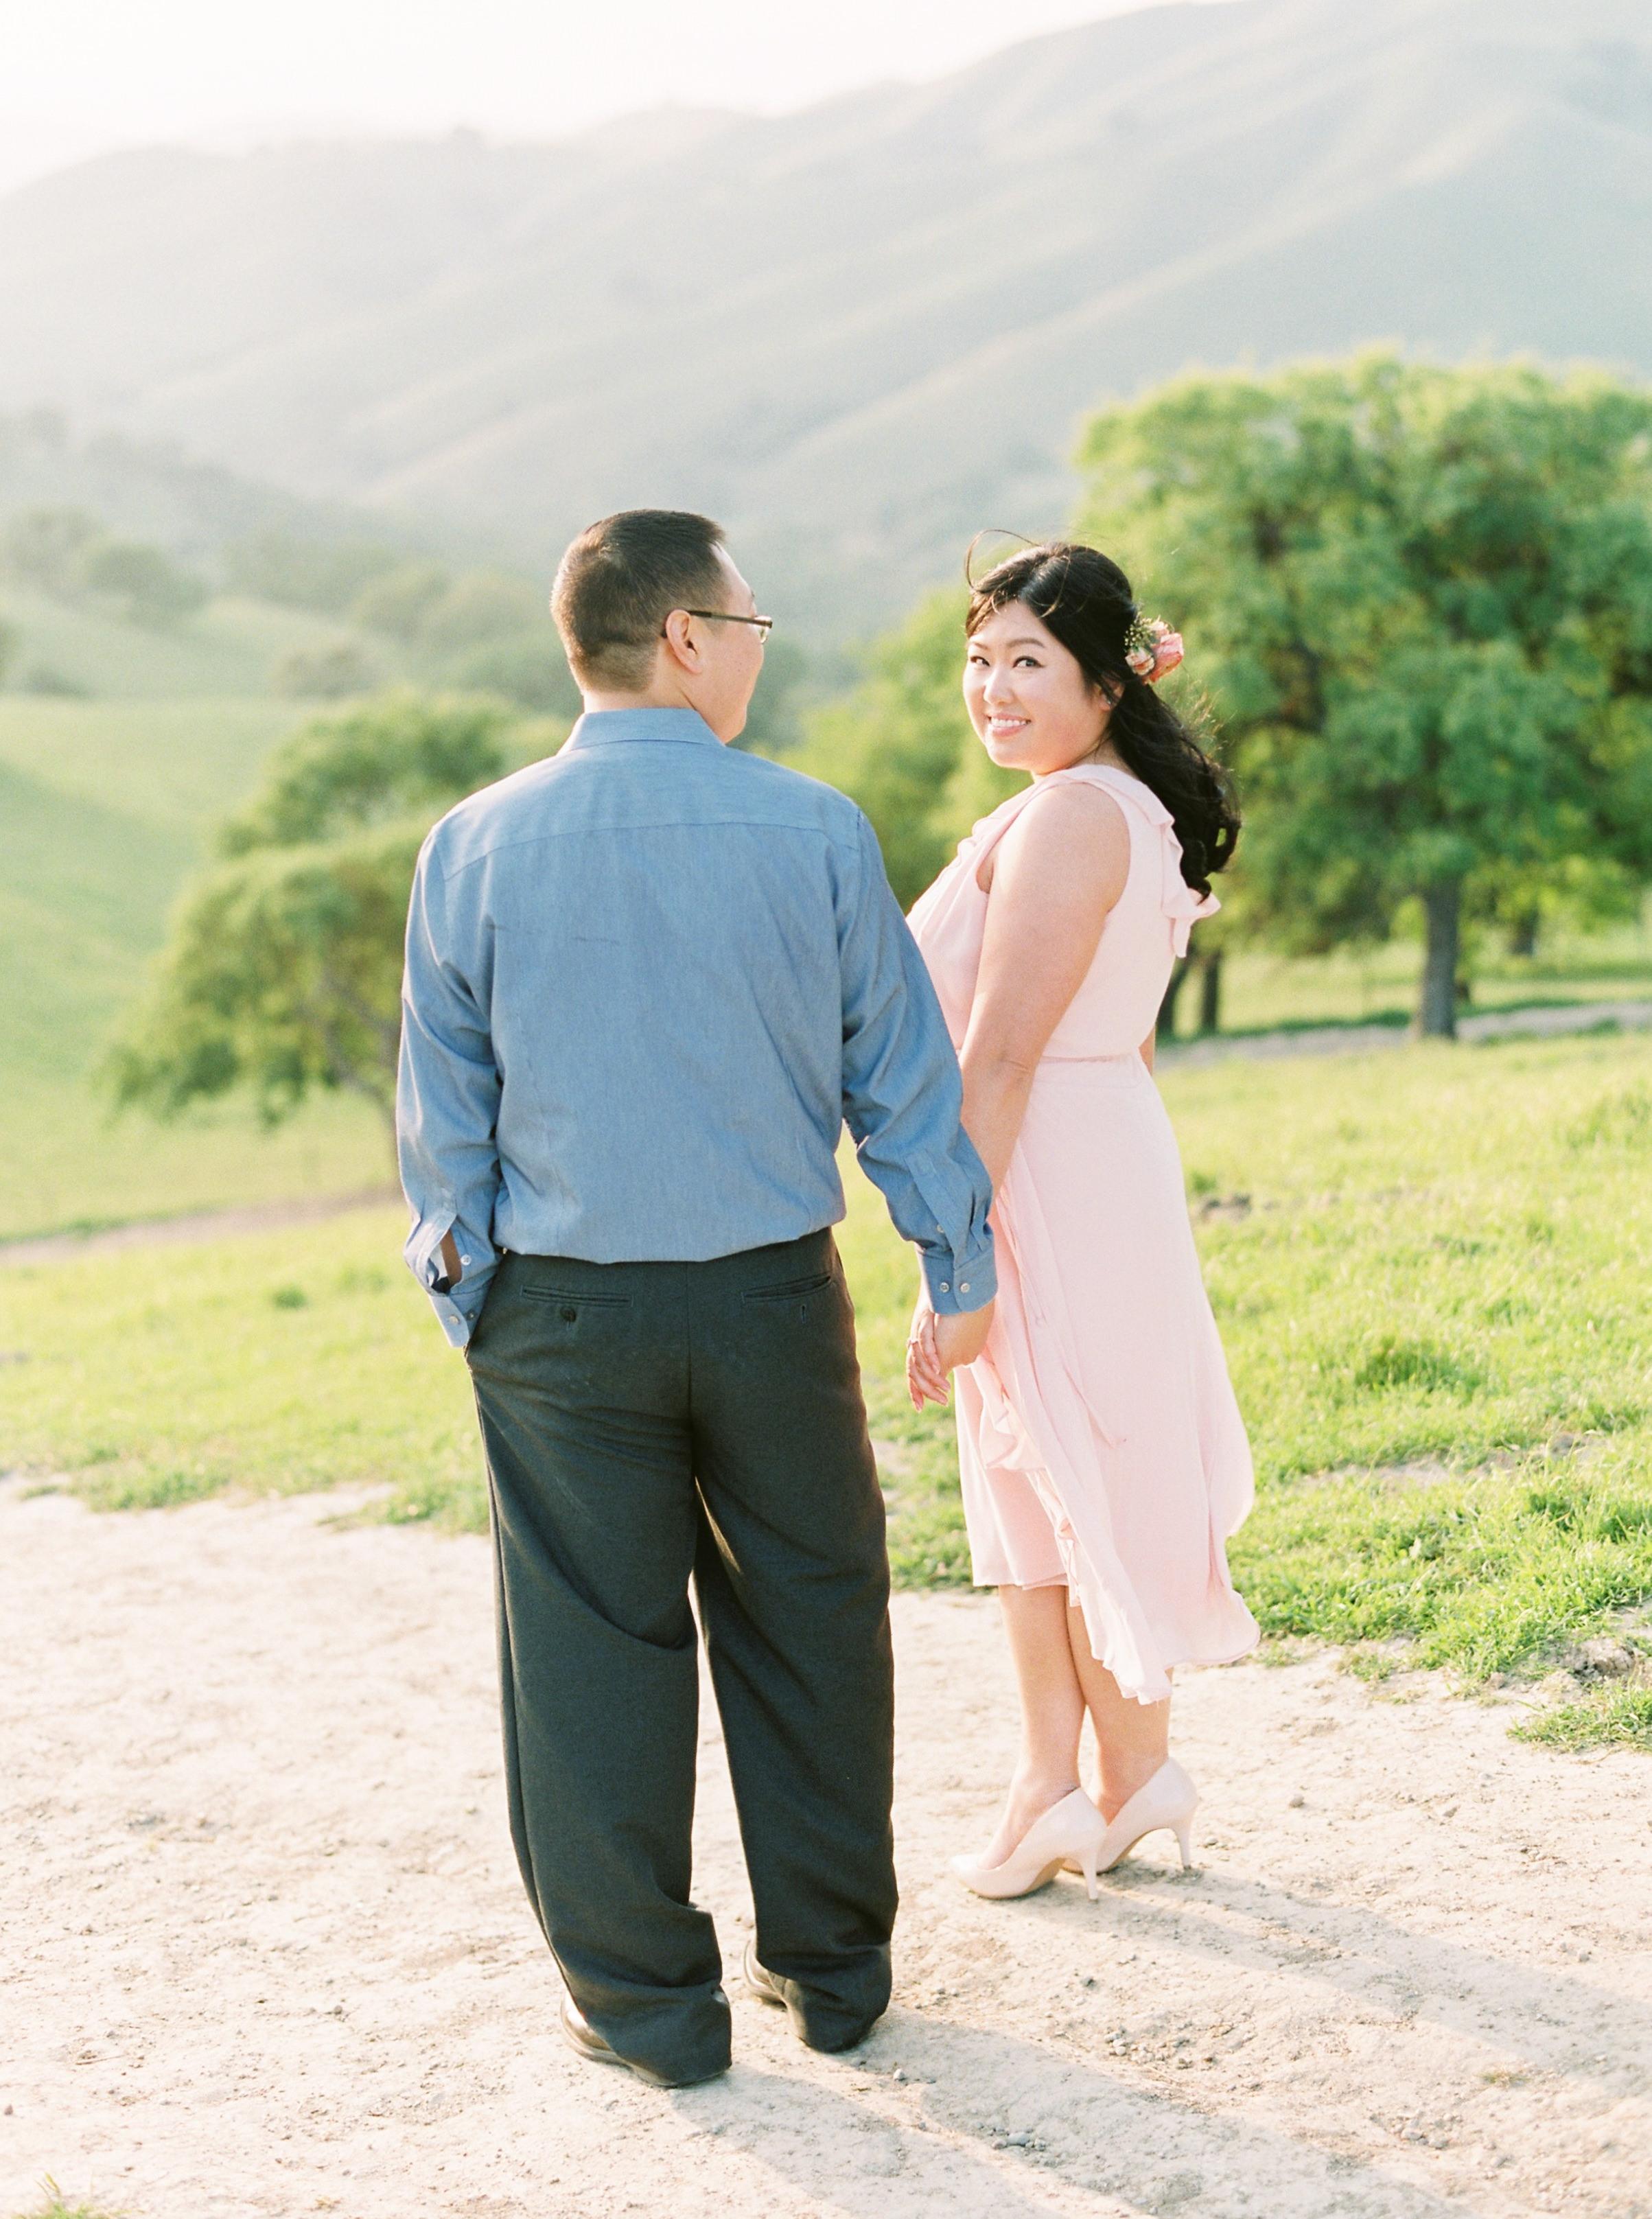 del-valle-livermore-bay-area-wedding-photographer-21.jpg